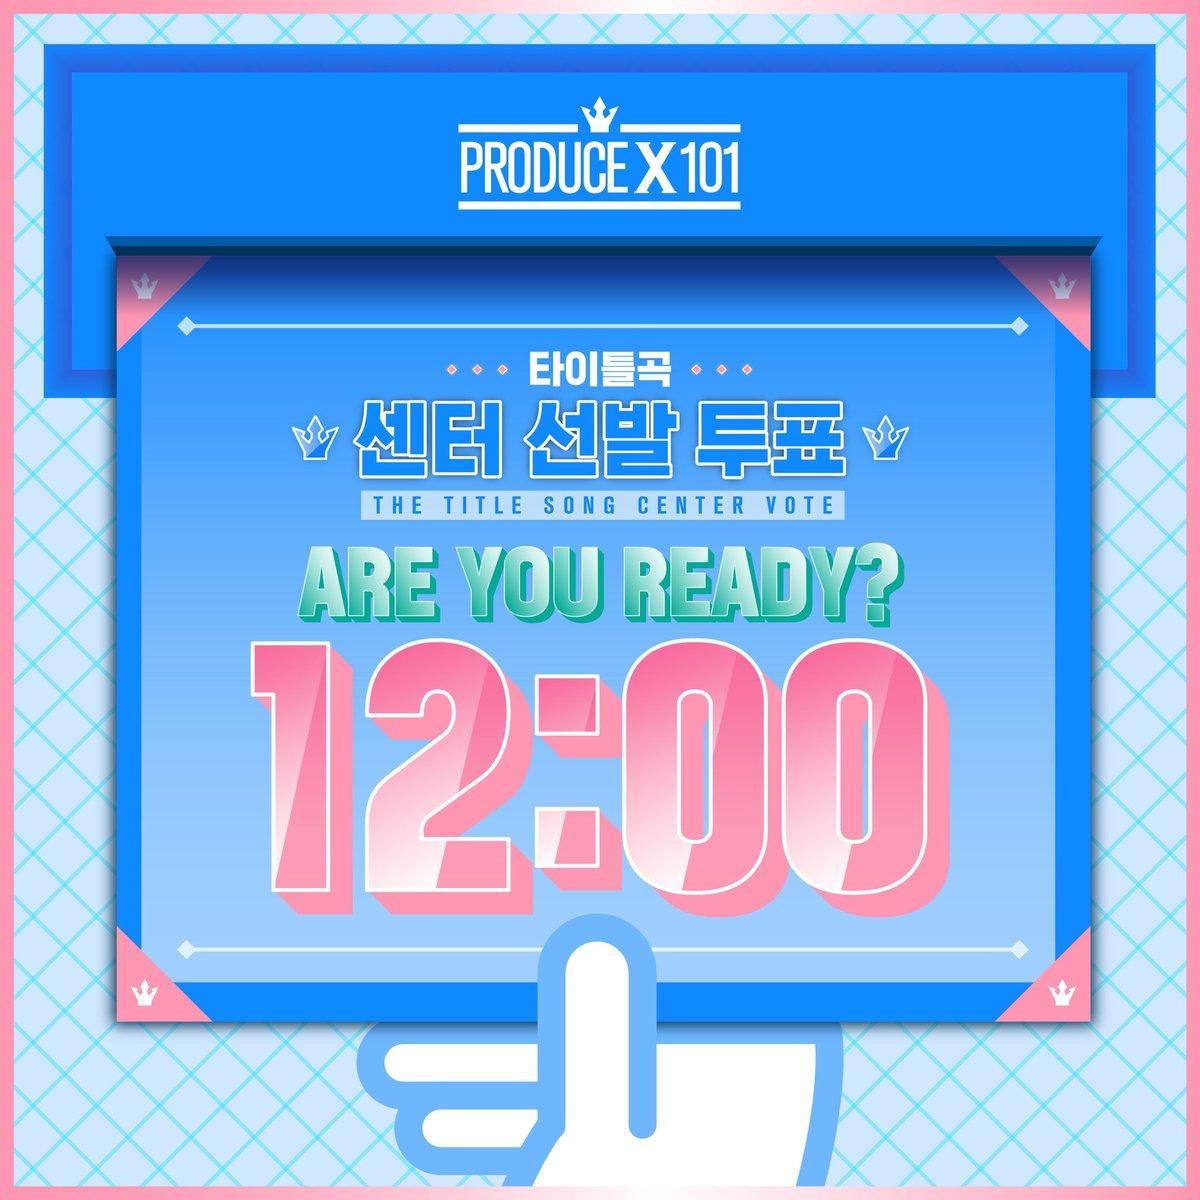 Mnet 프로듀스 X 101(PRODUCE X 101)'s photo on #PRODUCE_X_101